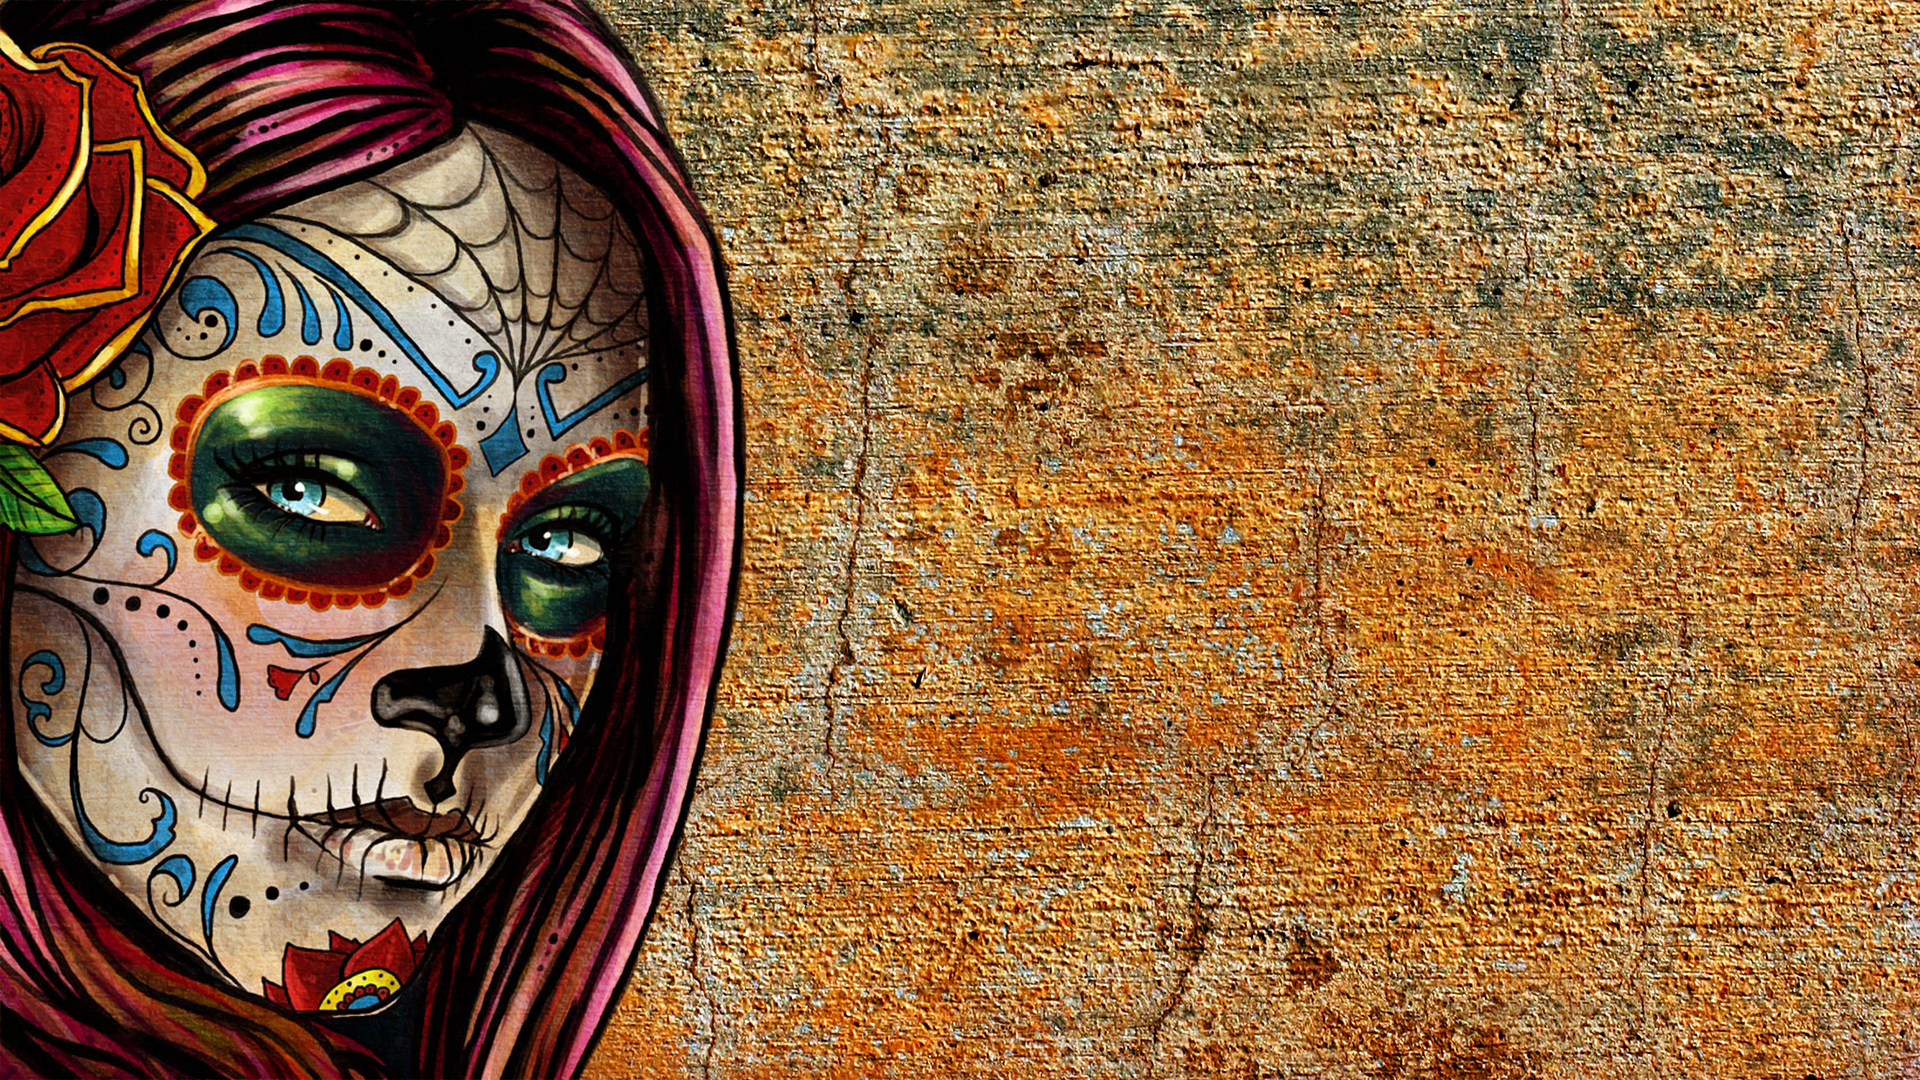 Go Back Images For Sugar Skull Wallpaper For Home 1920x1080